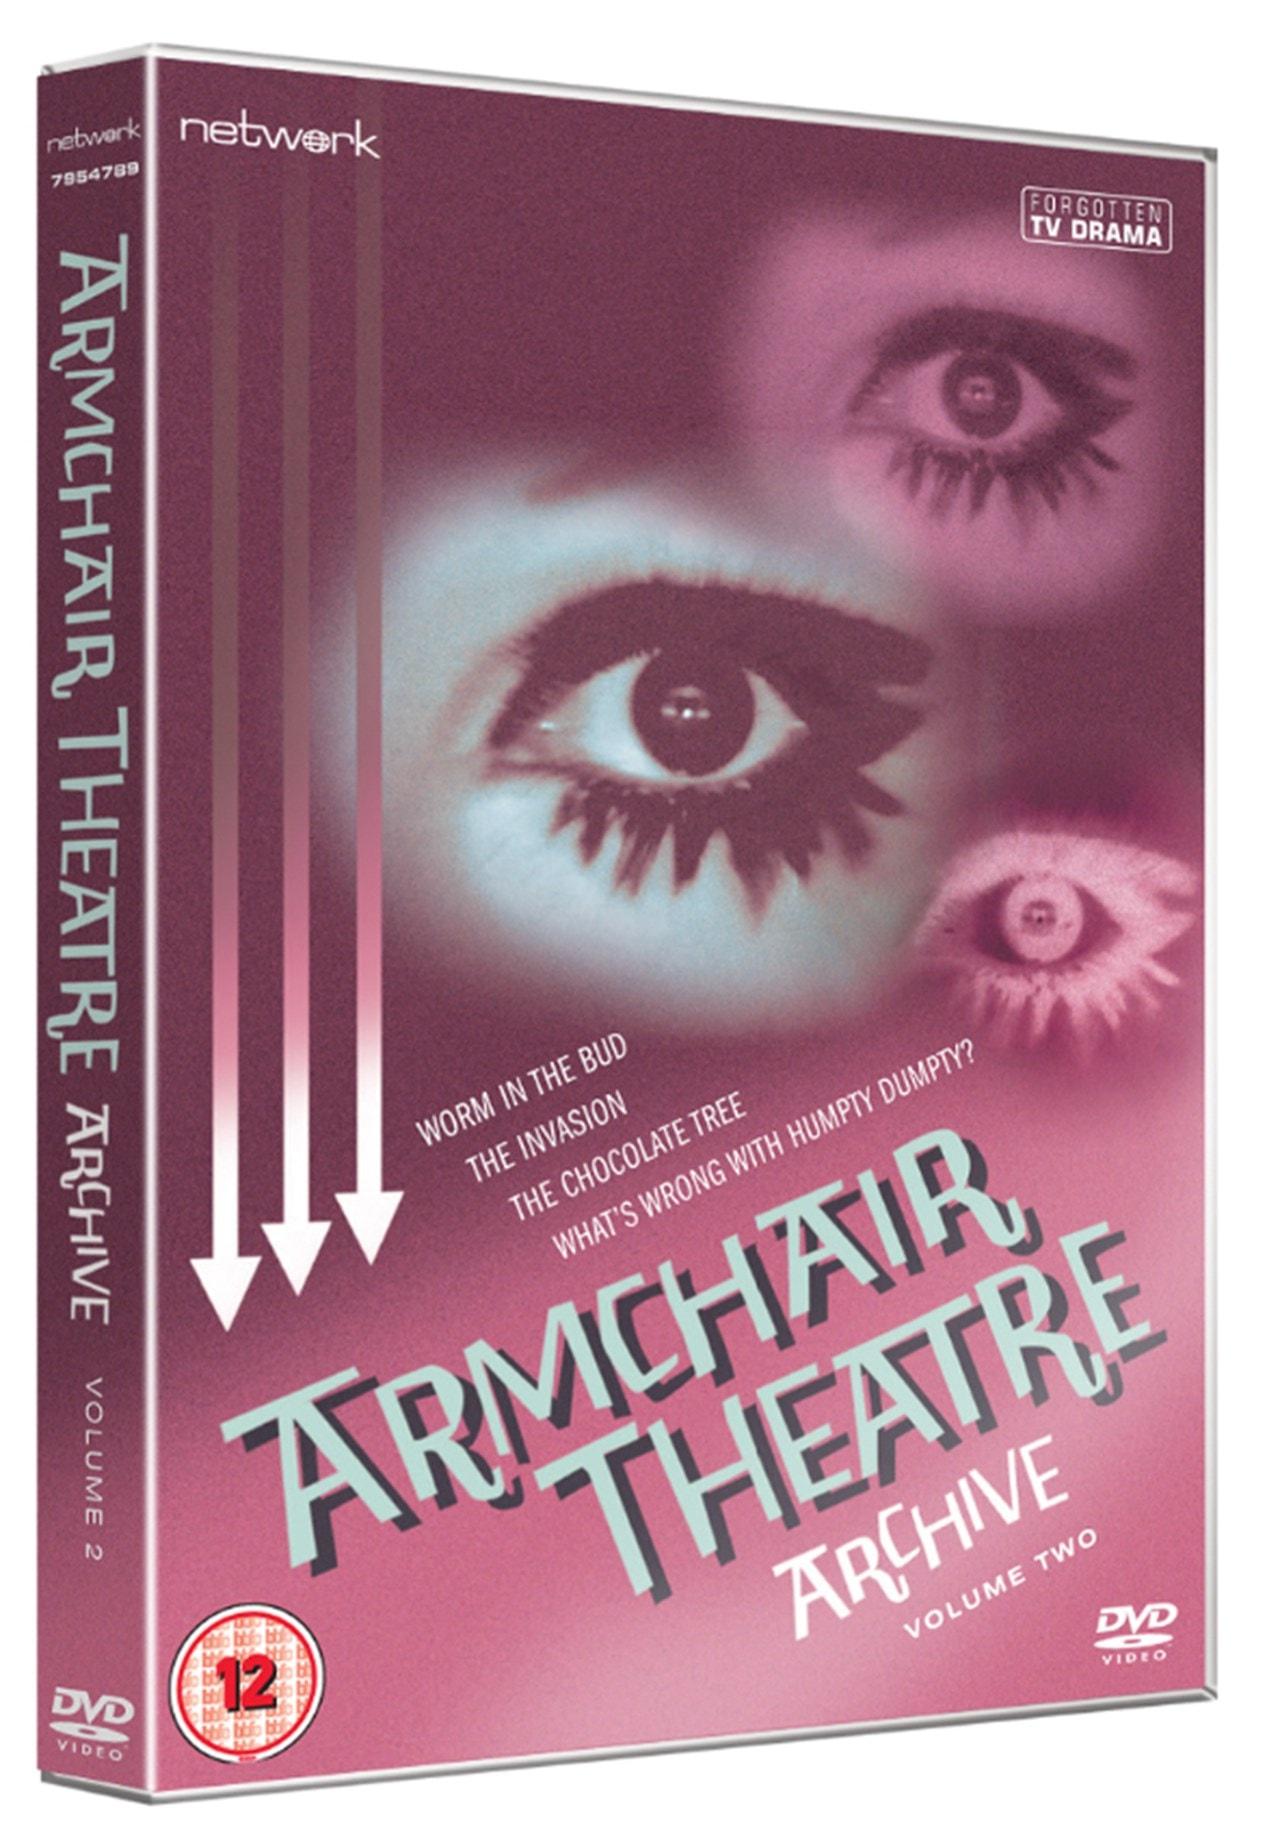 Armchair Theatre Archive: Volume 2 - 2